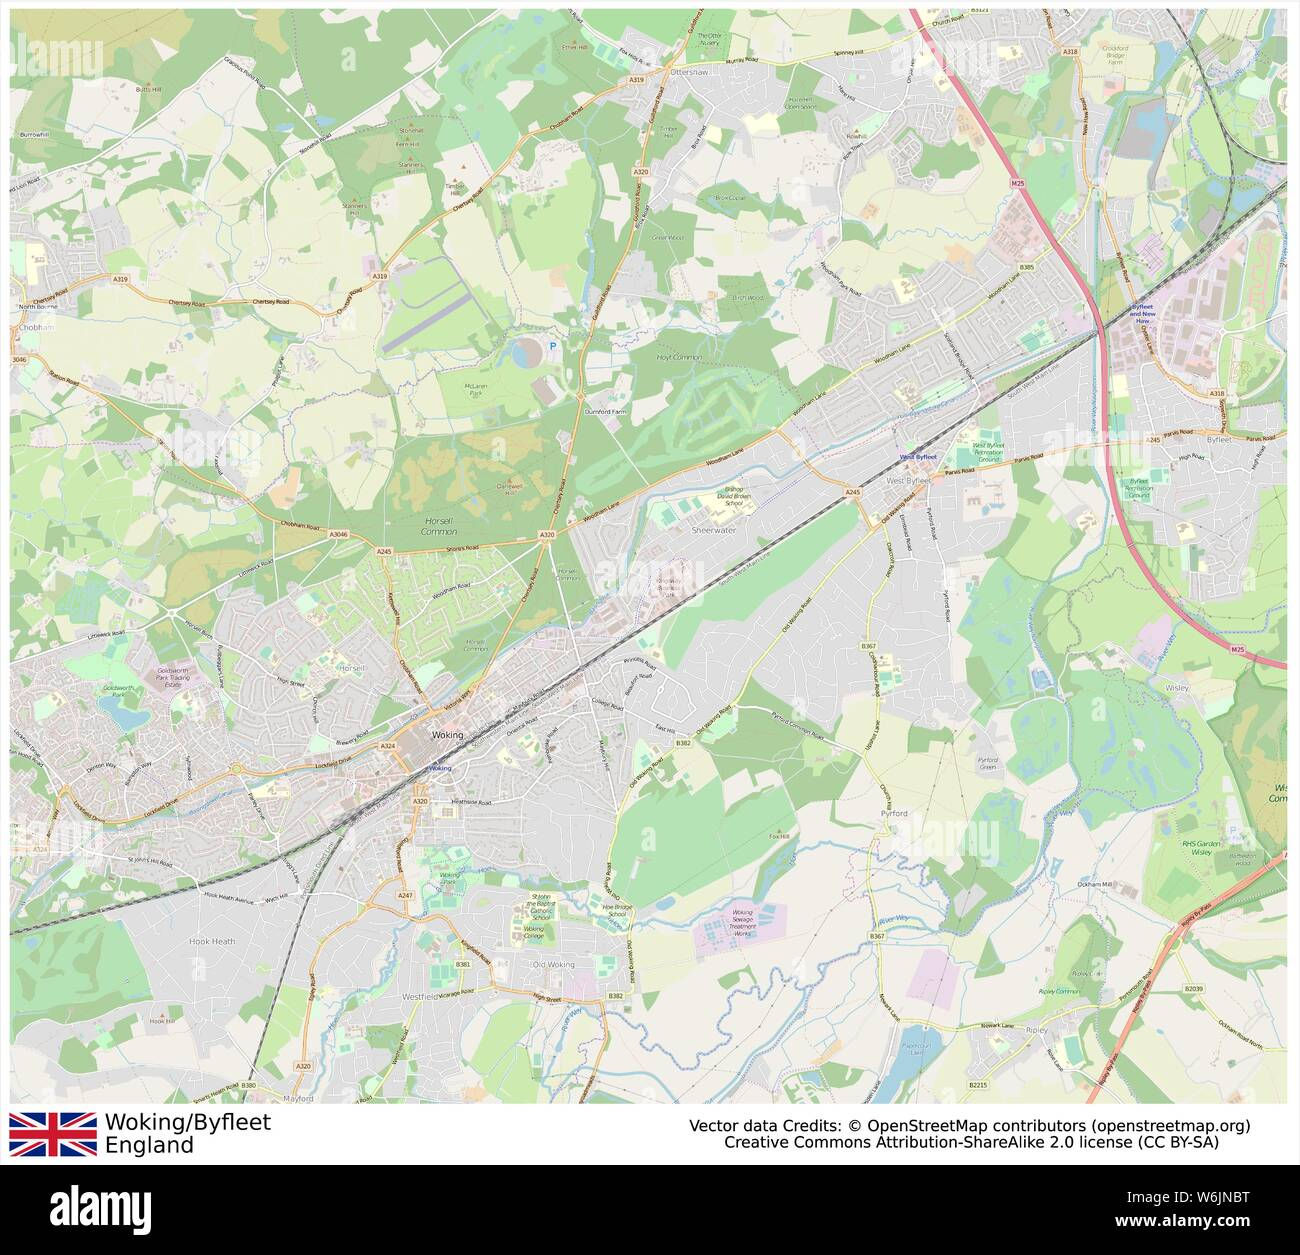 Full Map Of England.Woking Byfleet England United Kingdom Downtown Streets City Map Full